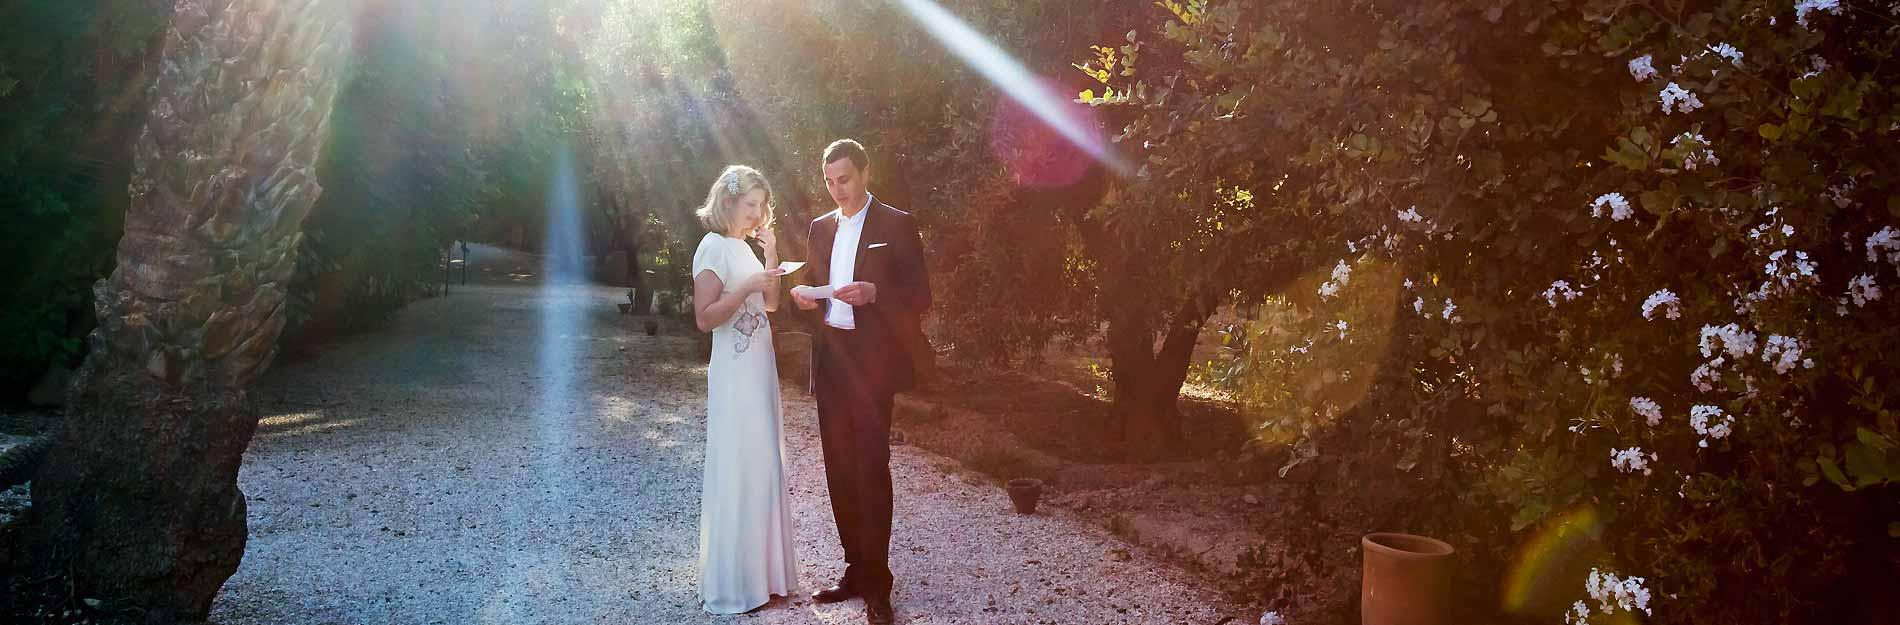 Reportage mariage Marrakech villa Jnane Tamsna